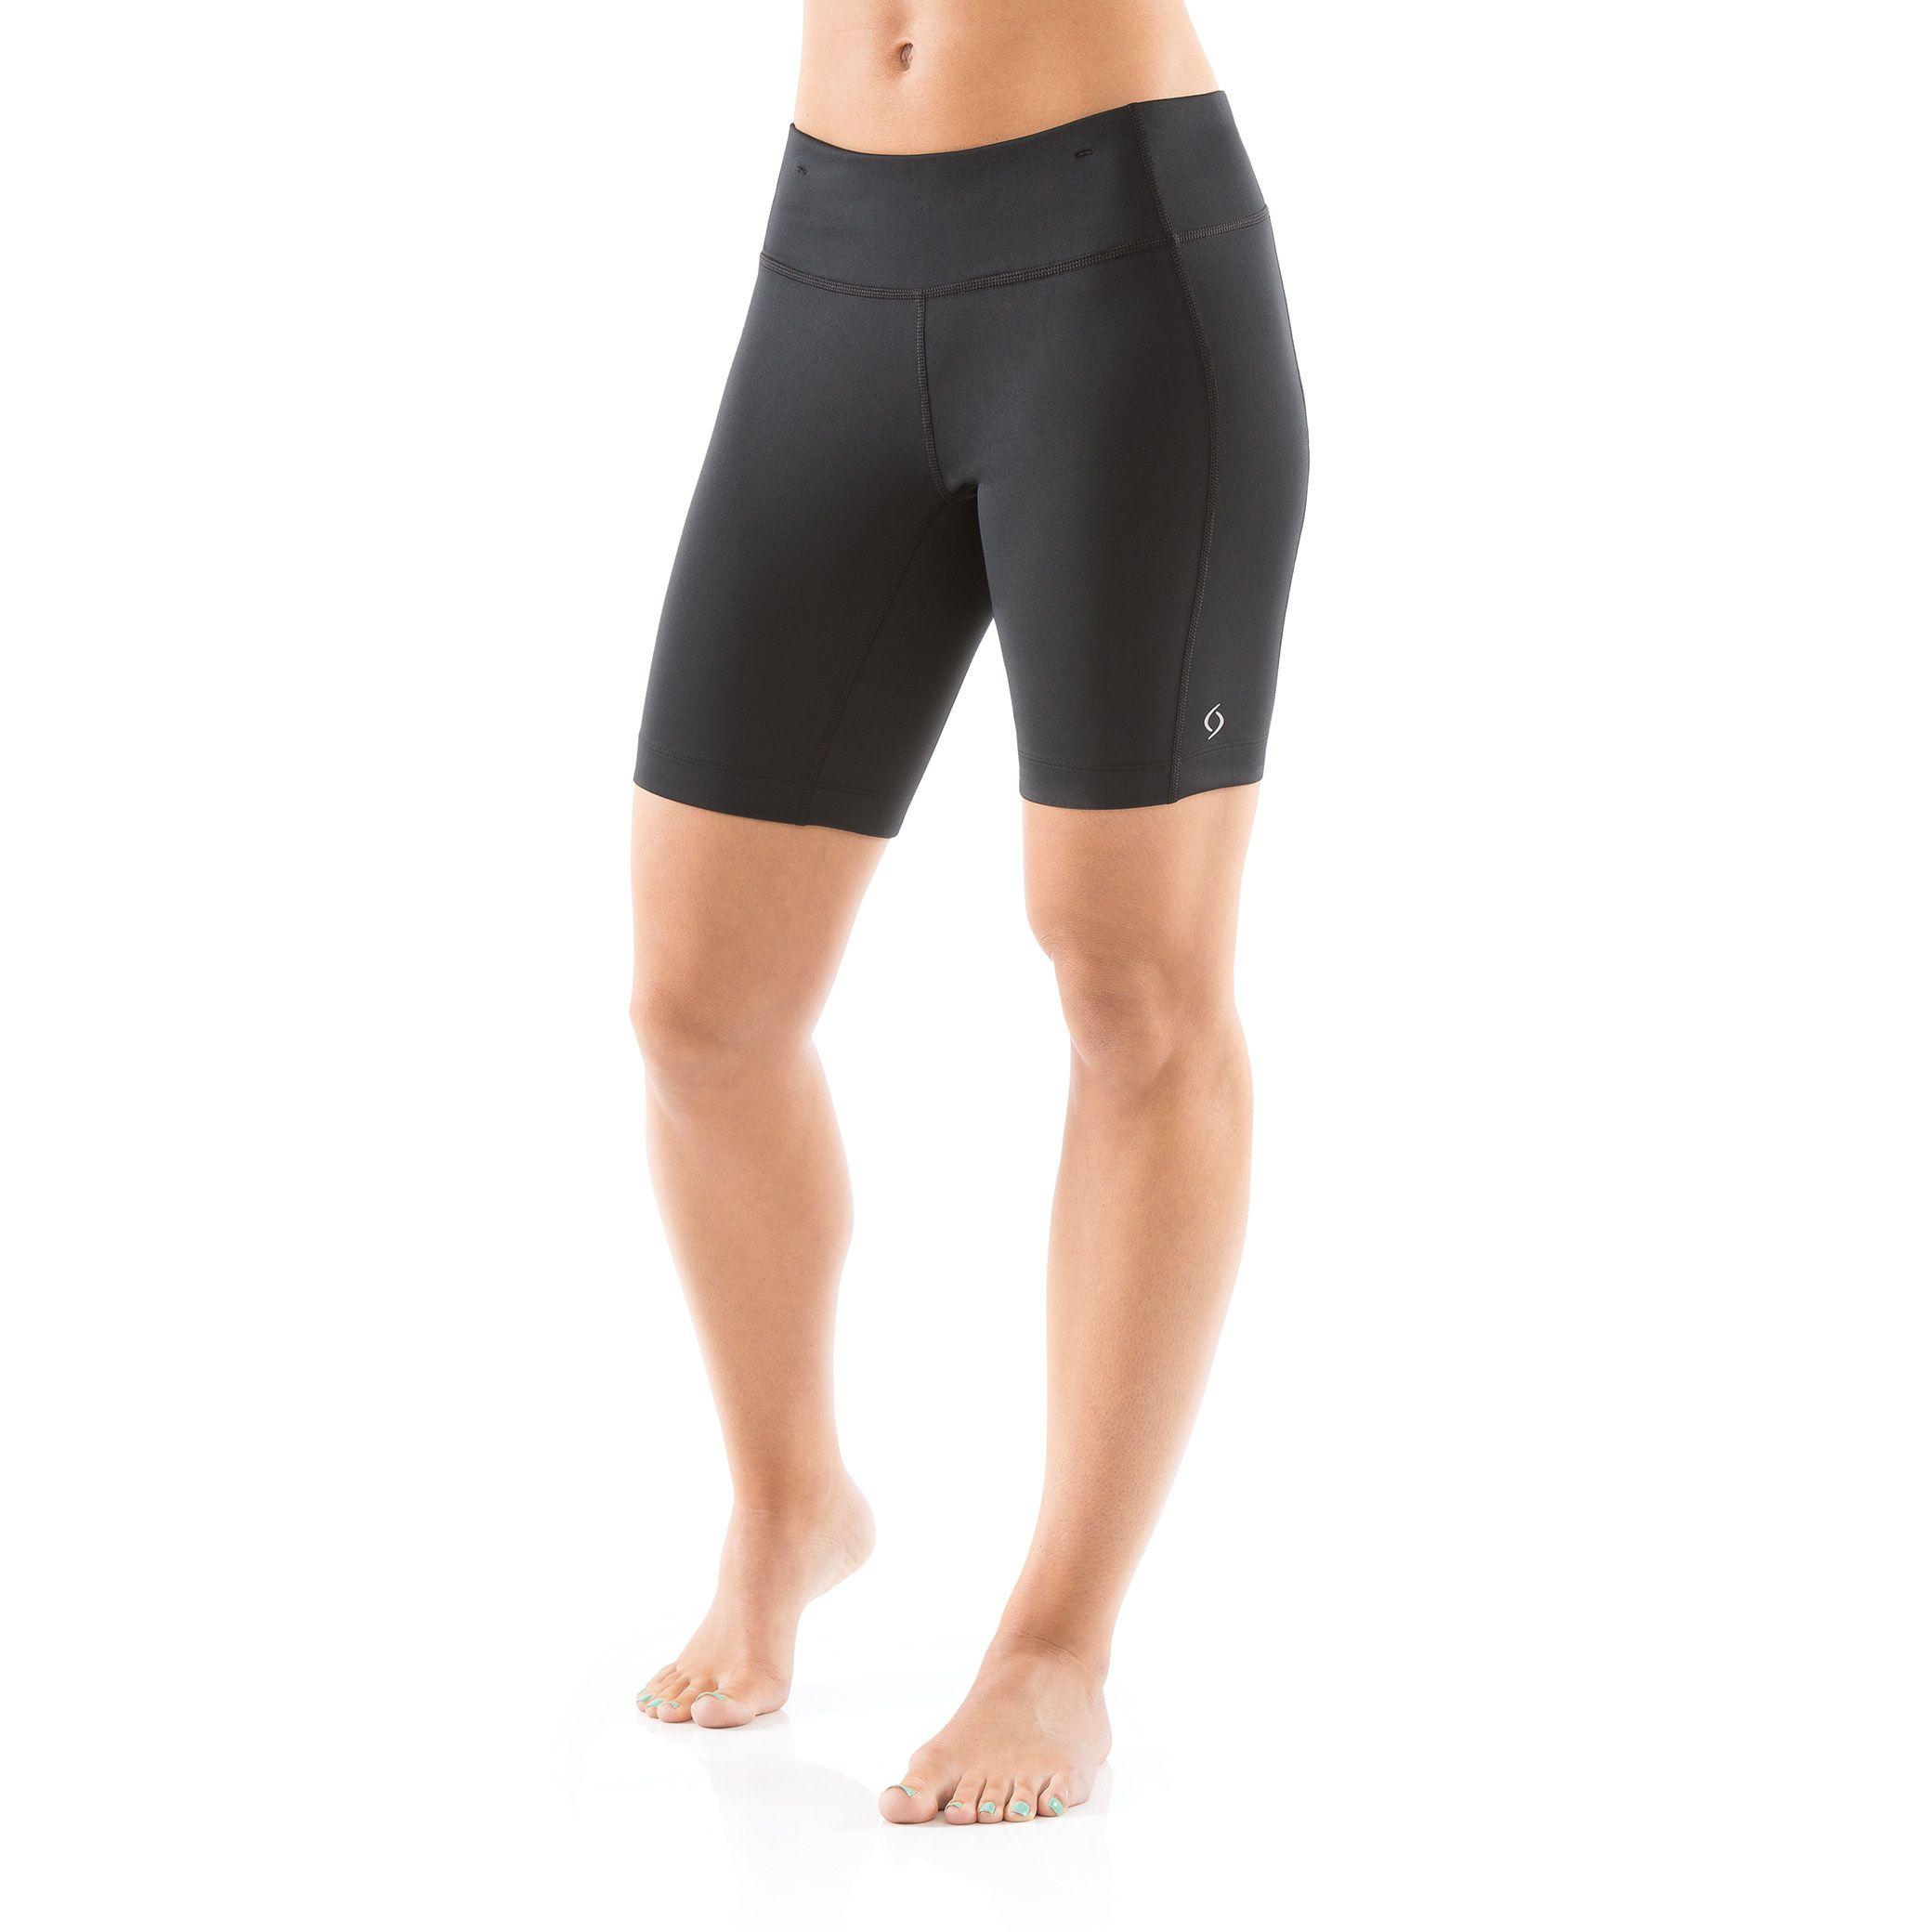 camo white comfort the deborah pants king yoga legging collection black gym products womens deborahthecamokingleggingsfront mesh comforter moving